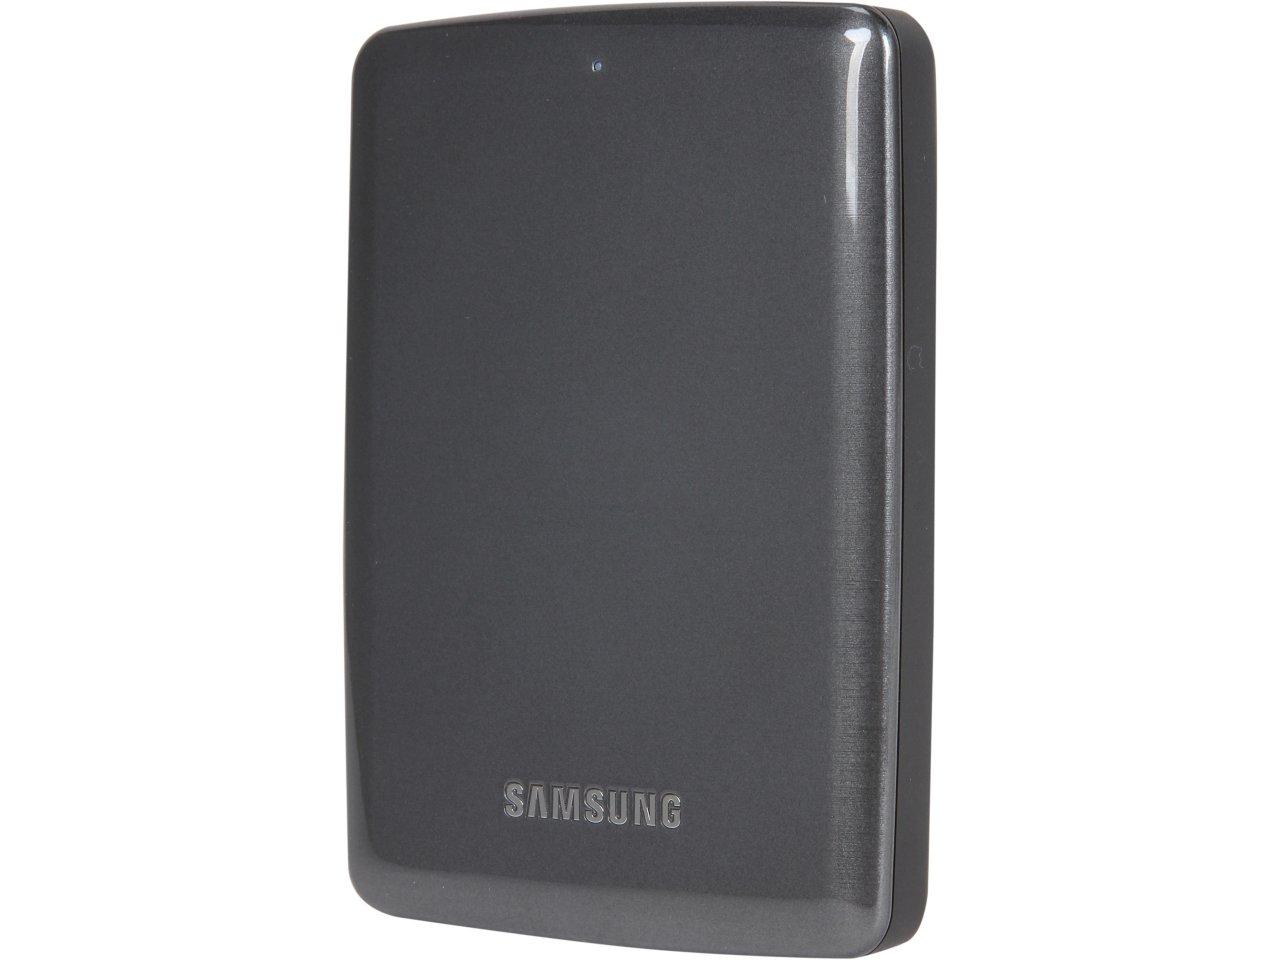 2 TB Samsung P3 Portable USB 3.0 External Hard Drive w/ 3 Year Warranty for $79.99 AC + Free Shipping @ Newegg.com